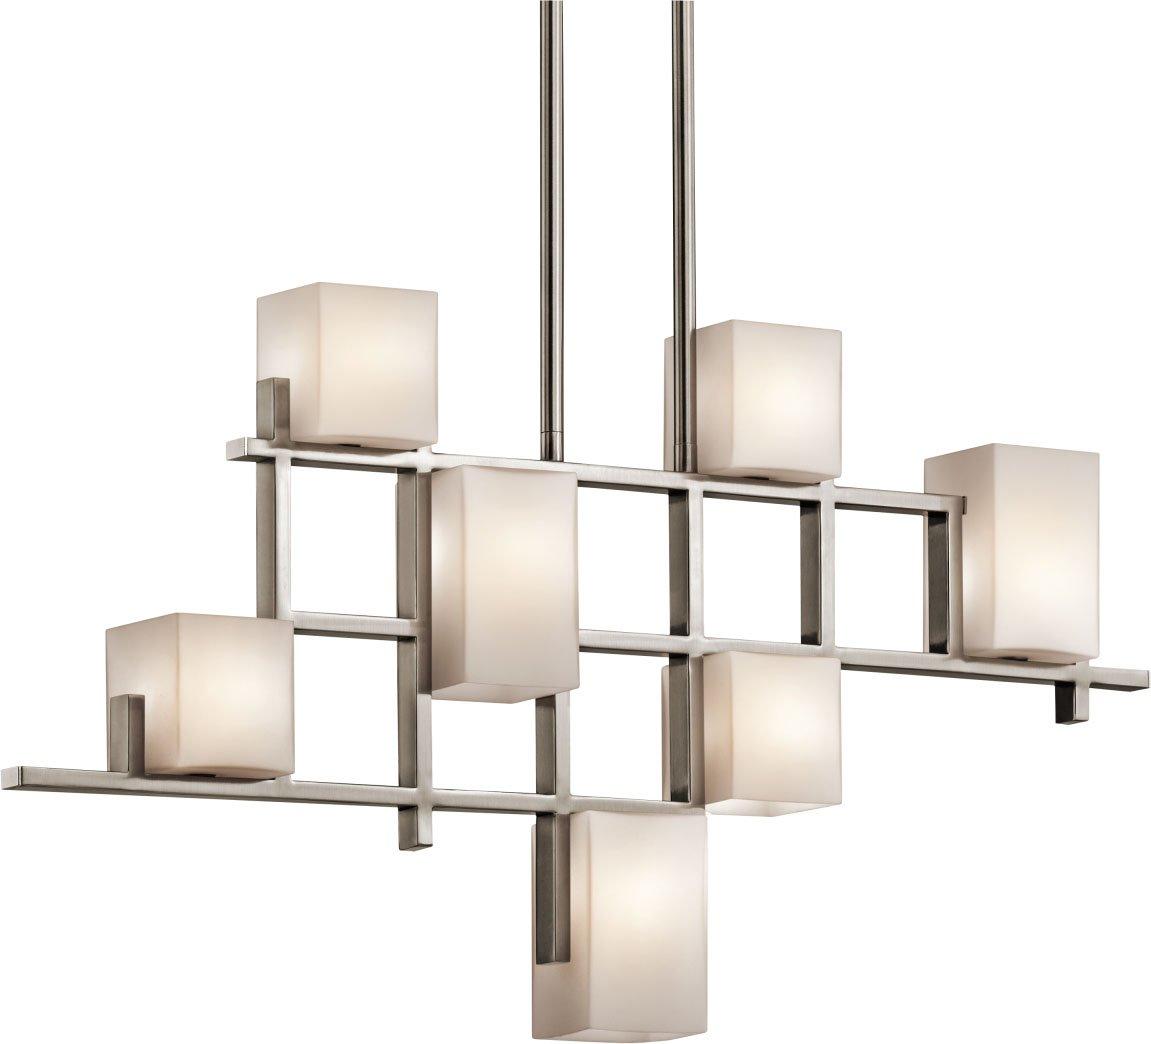 Kichler 42941CLP Seven Light Linear Chandelier - - Amazon.com for modern chandelier png  186ref